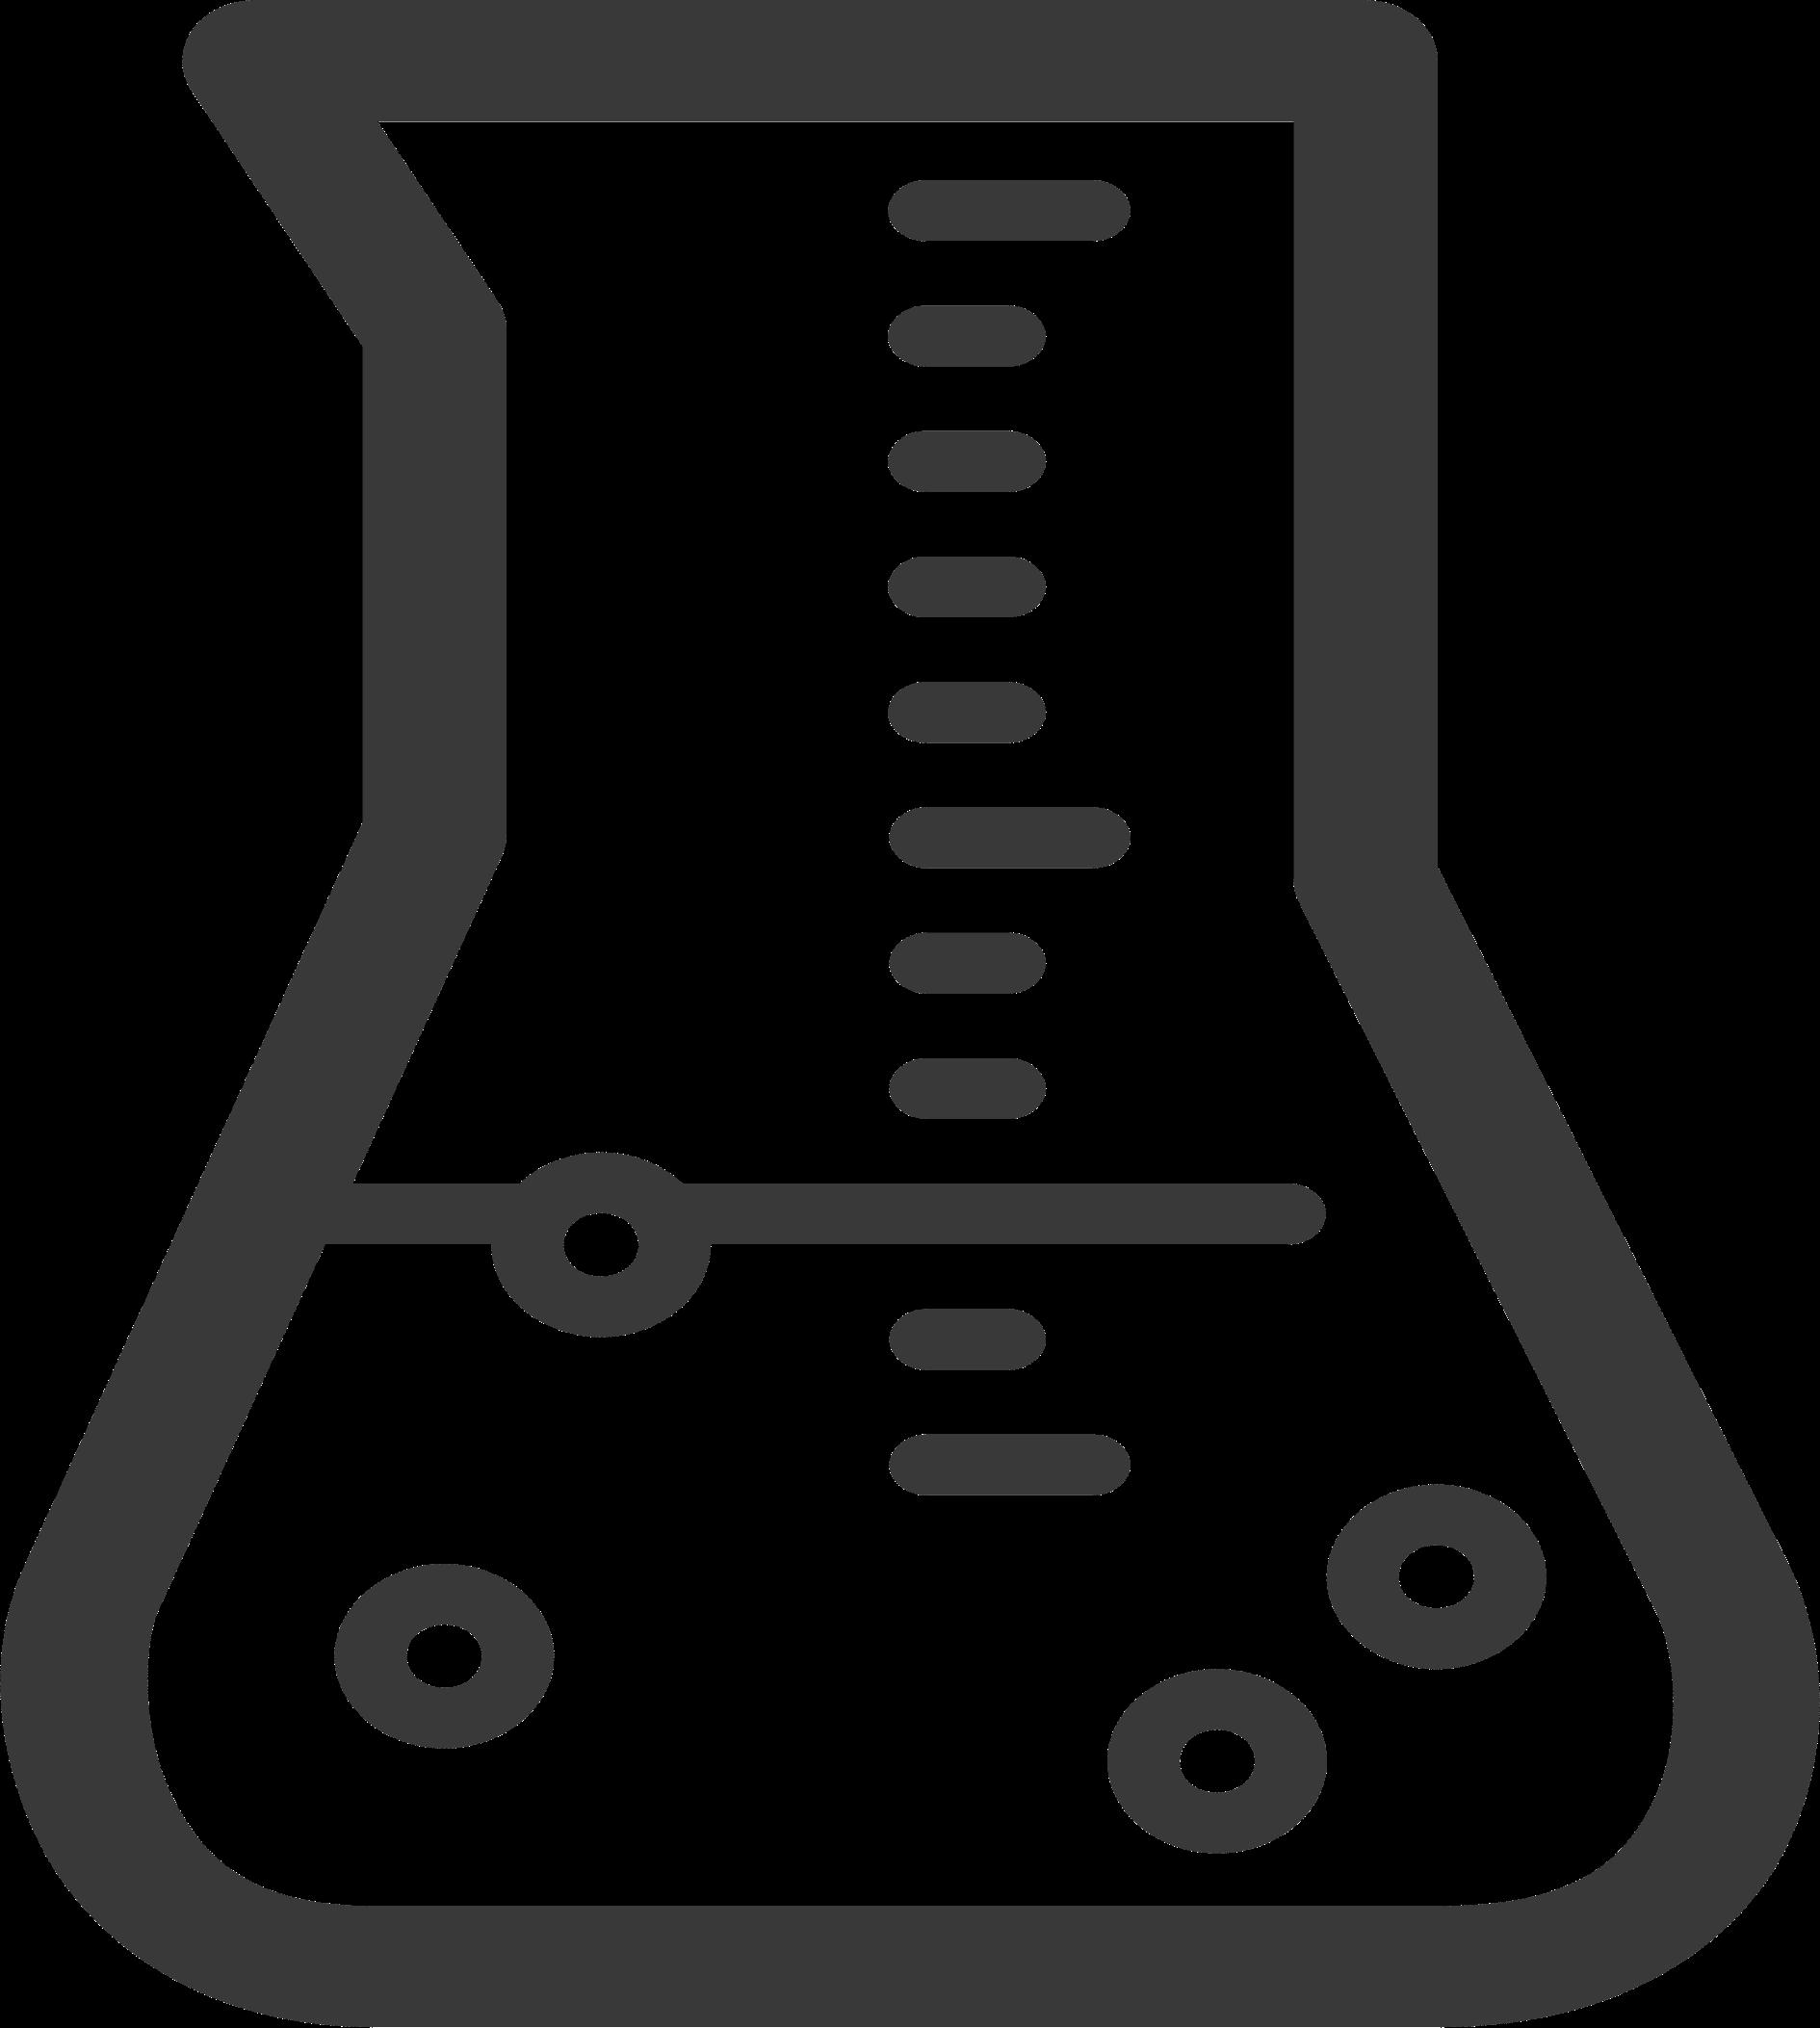 chemistry beaker vector clipart image free stock photo public rh goodfreephotos com baker clip art baker clipart public domain